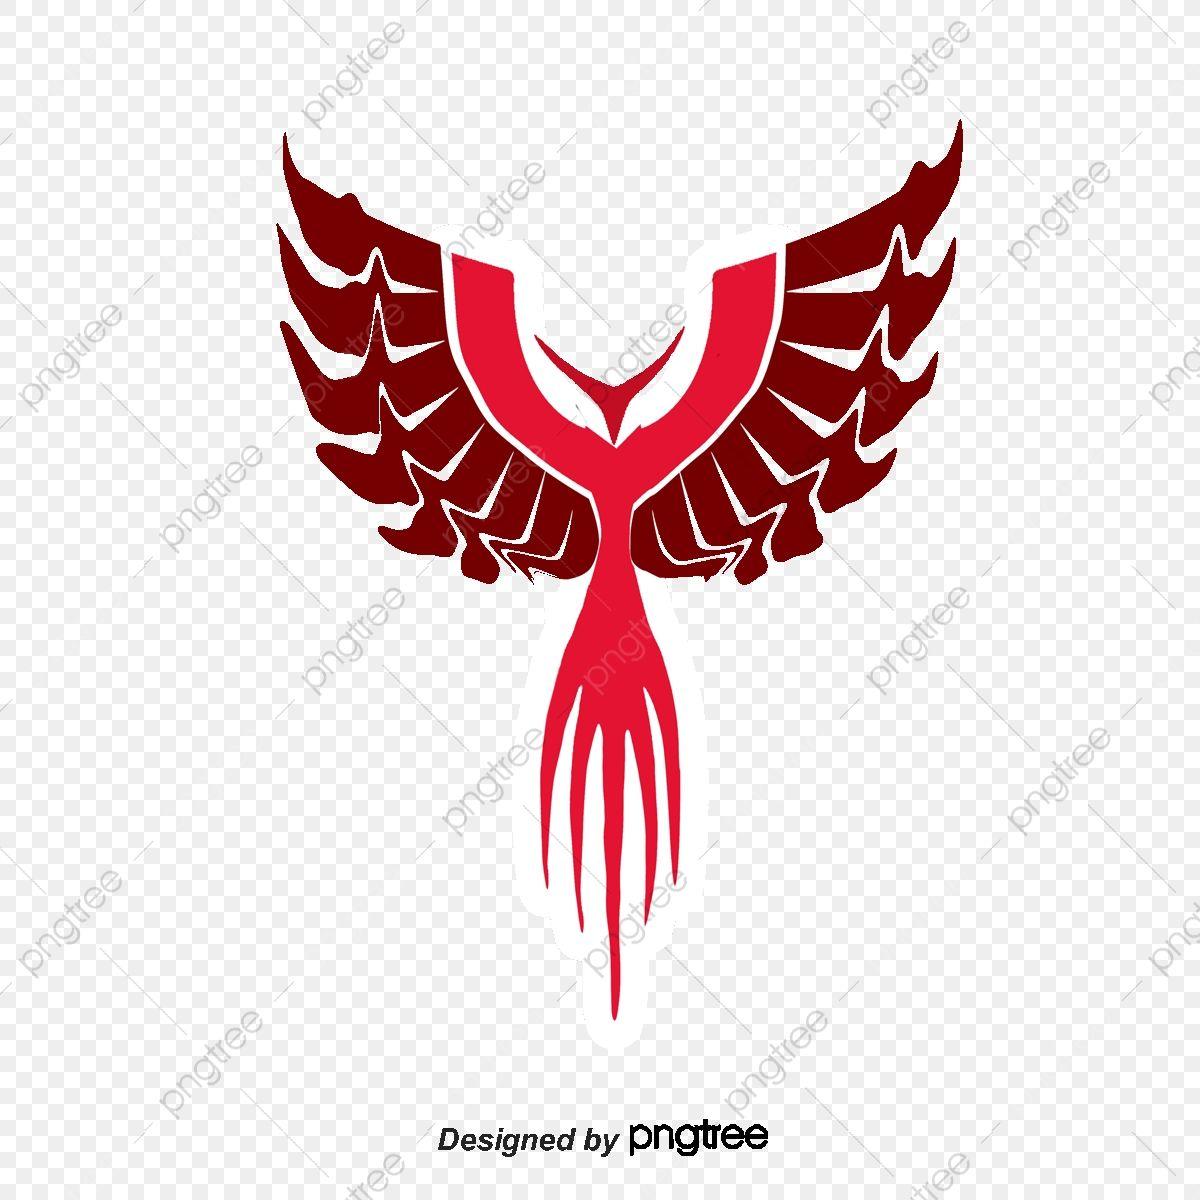 Red Phoenix Contour Phoenix Vector Decoration Vector Png Transparent Clipart Image And Psd File For Free Download Phoenix Vector Texture Vector Vector